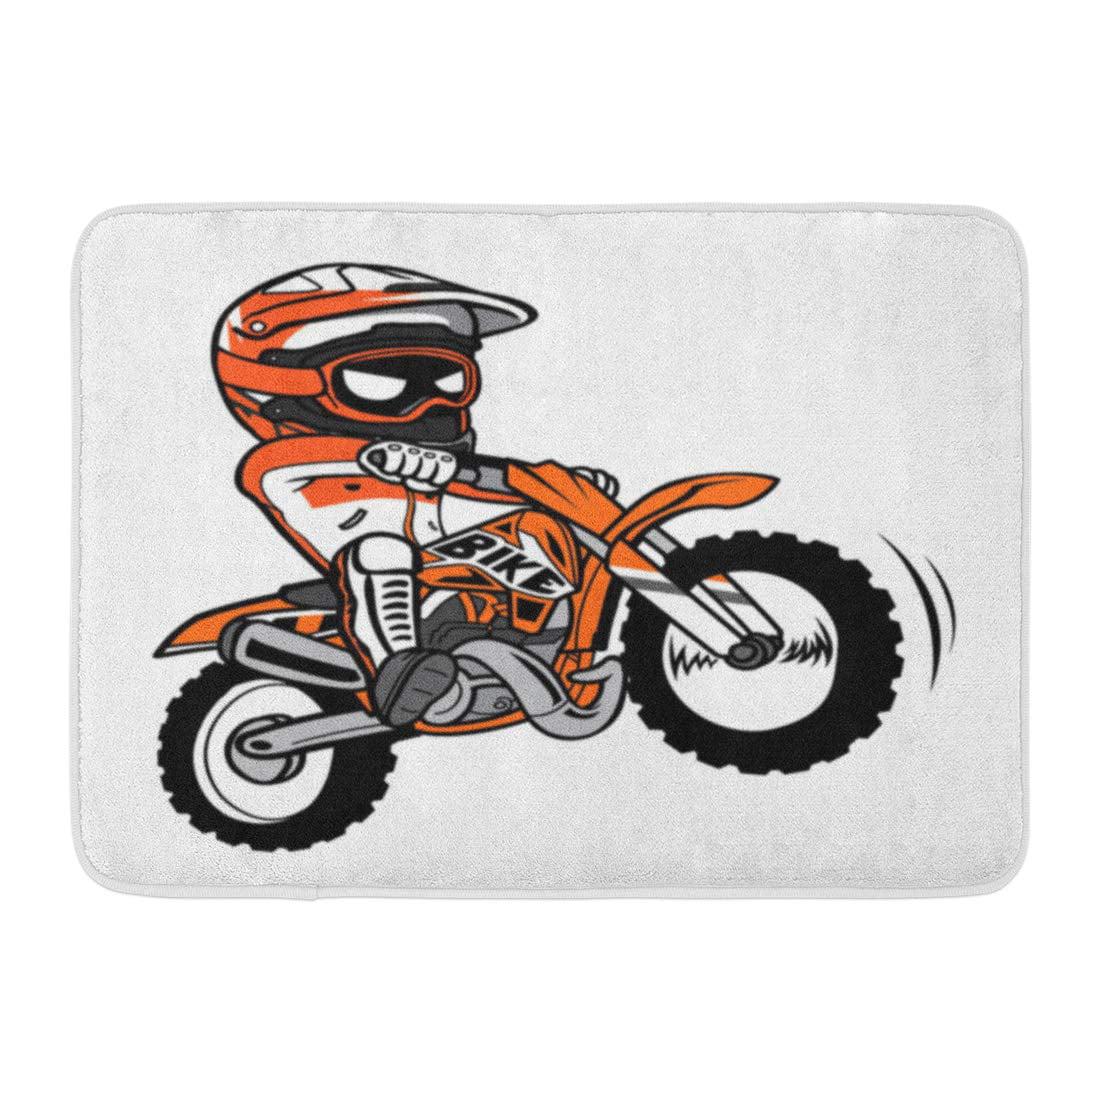 Yusdecor Bike Motocross Splashing Biker Motorcycle Rider Dirt Cartoon Rug Doormat Bath Mat 23 6x15 7 Inch Walmart Canada